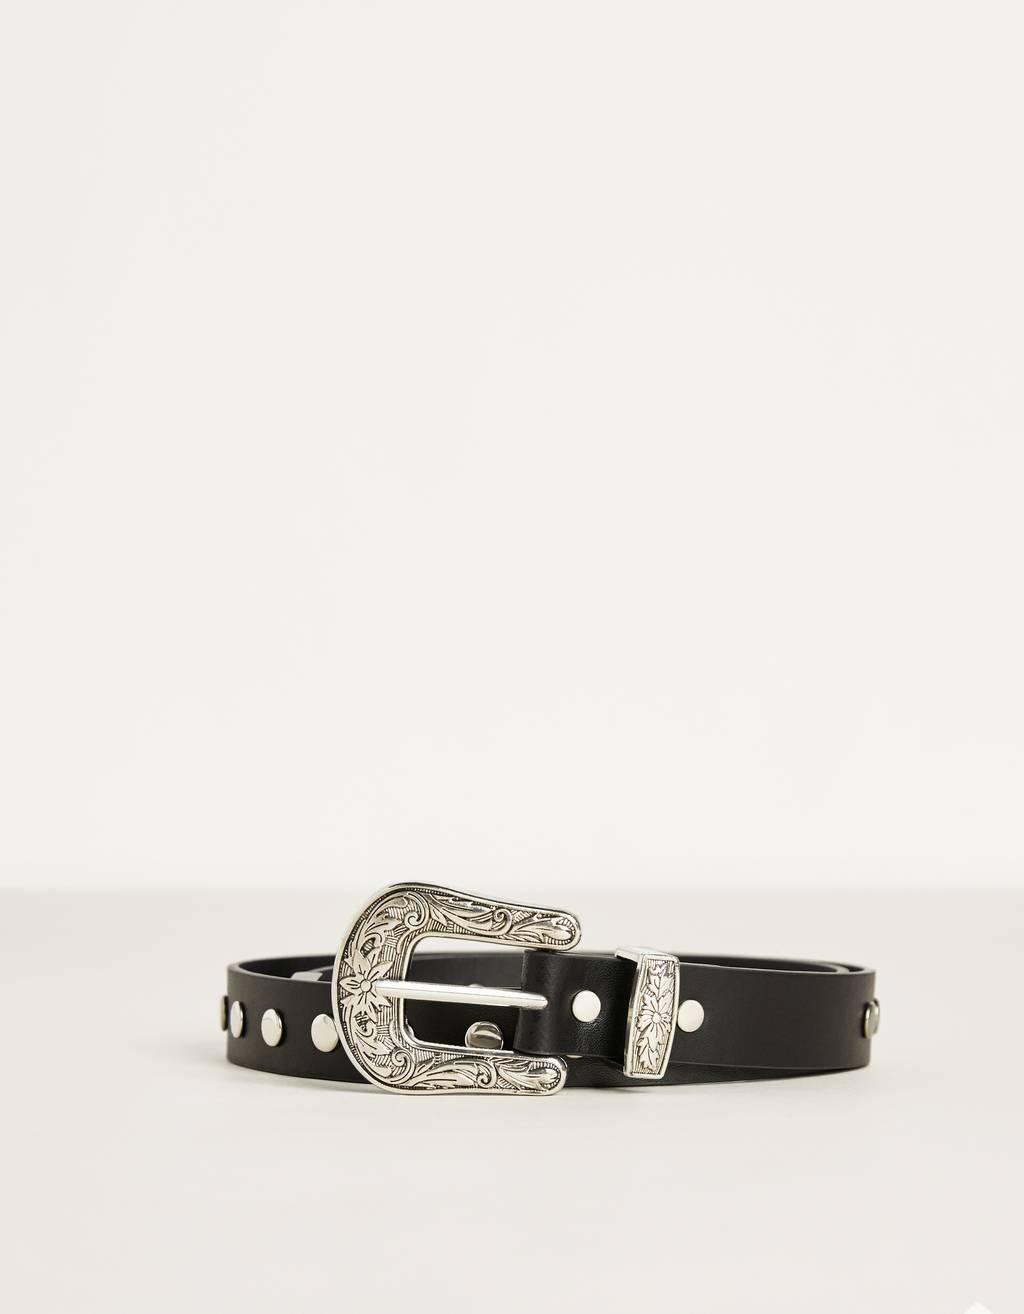 Studded cowboy belt